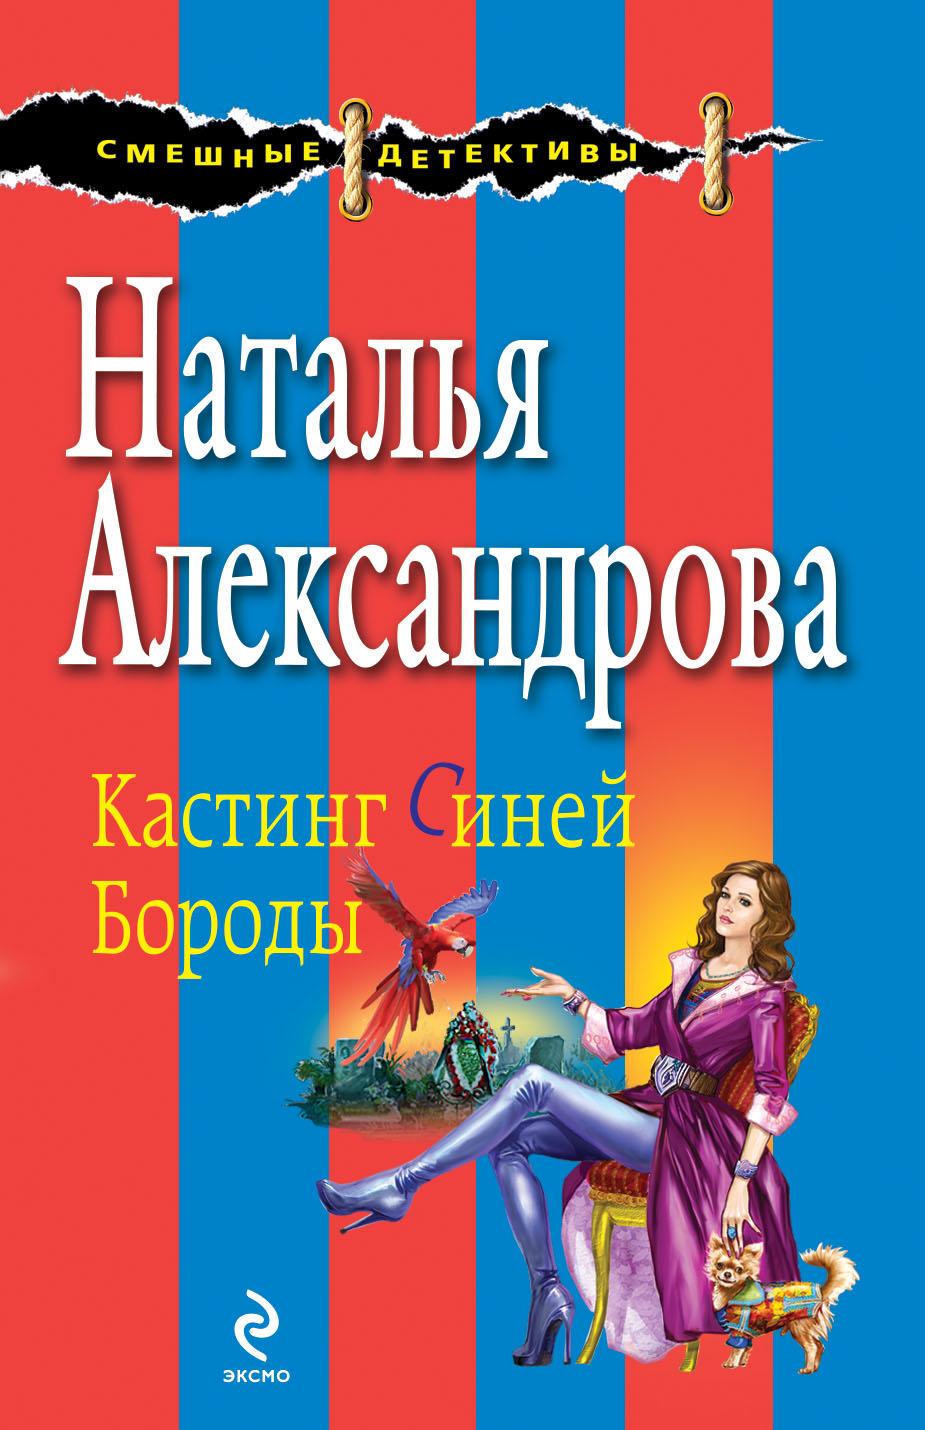 Александрова Н.Н. Кастинг Синей Бороды ISBN: 978-5-699-77839-3 цена